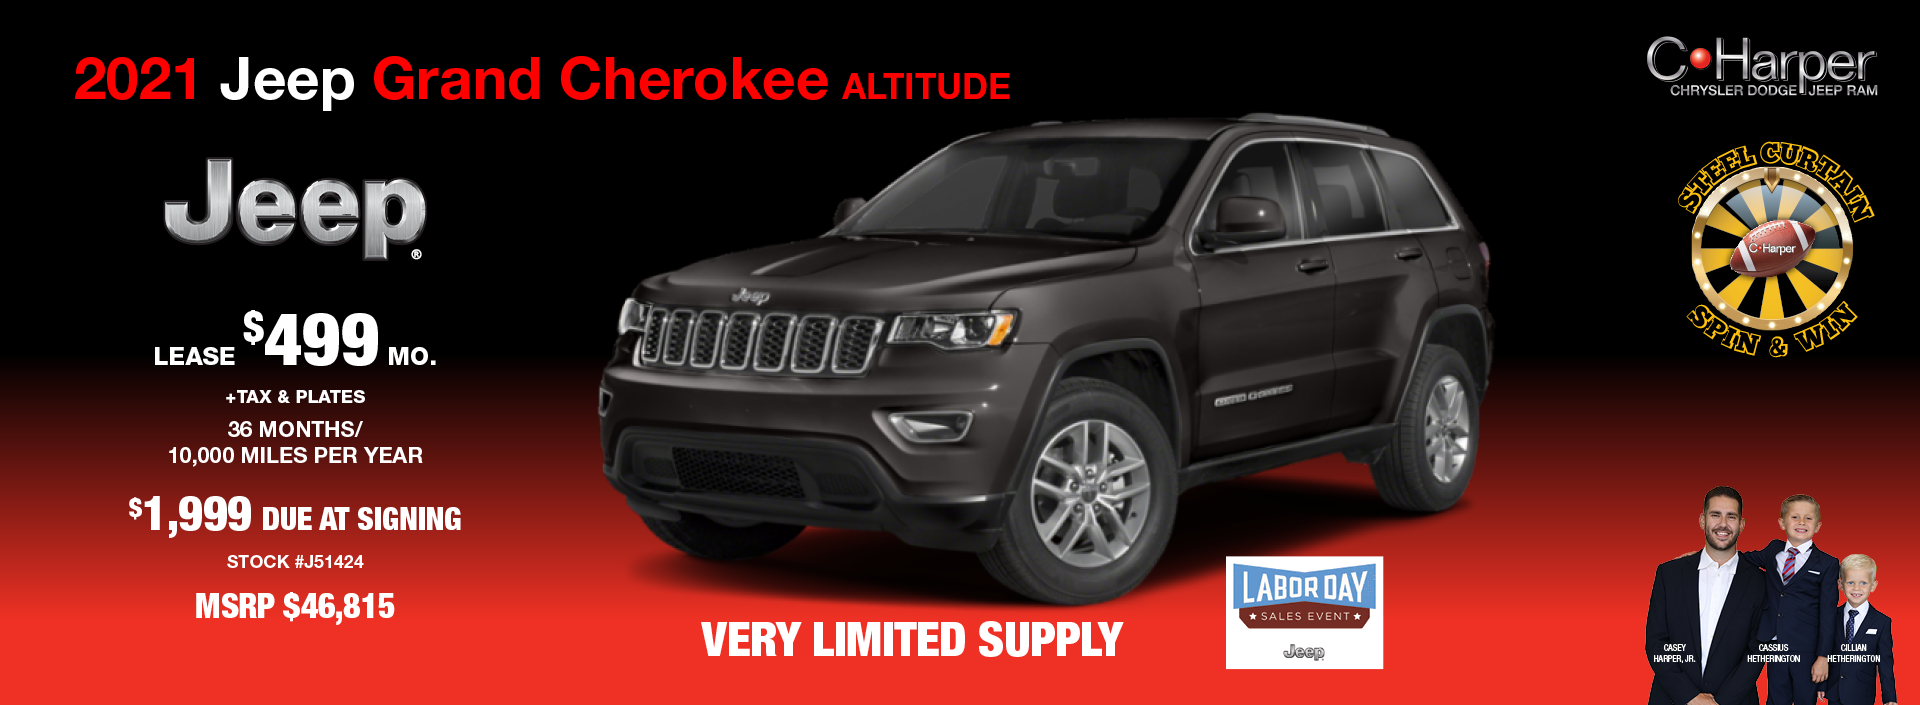 2021 Jeep Grand Cherokee Altitude